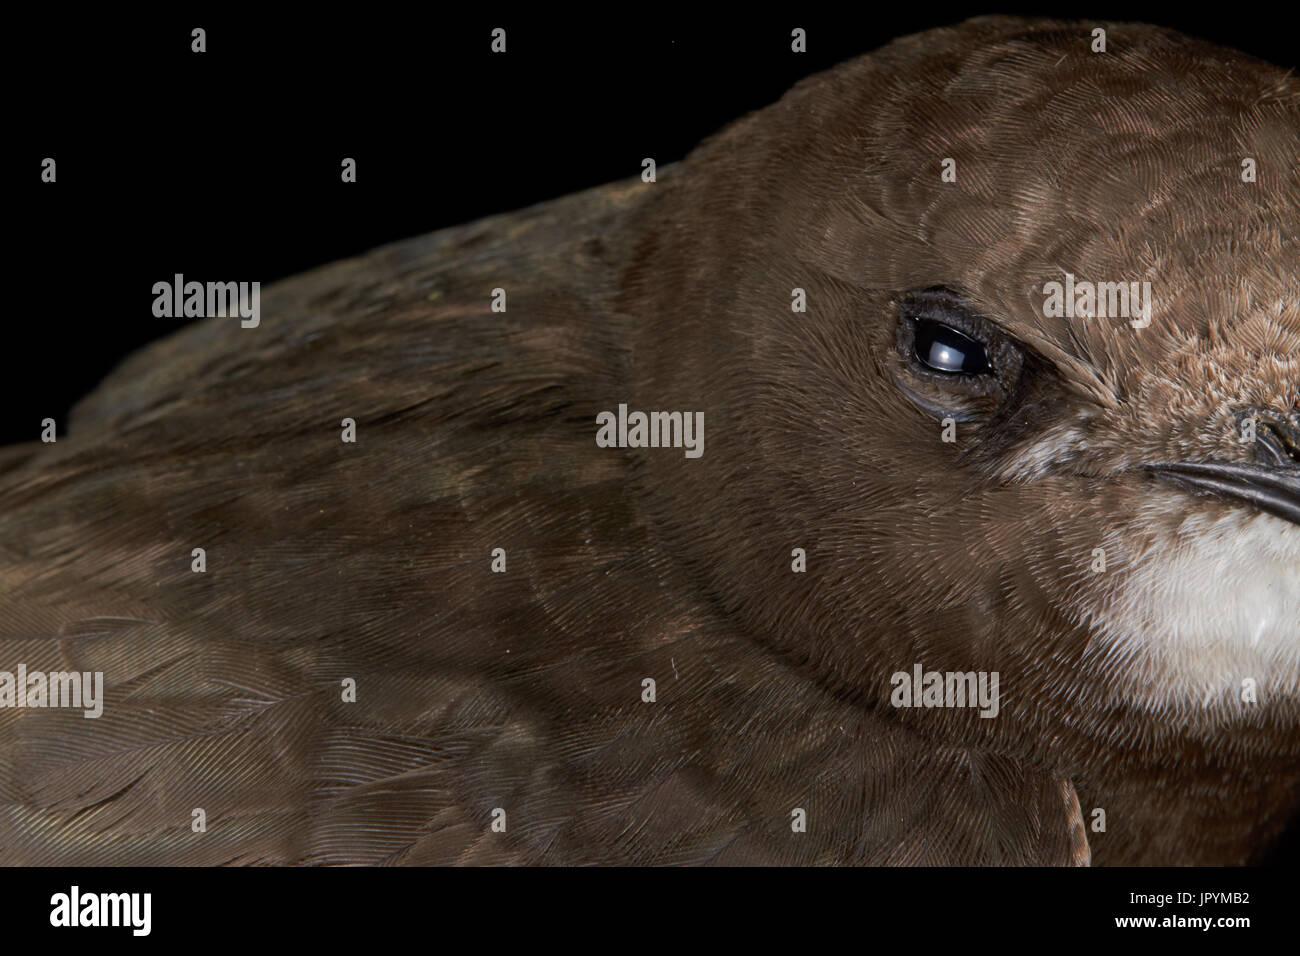 Portrait of Common Swift on black background - Stock Image